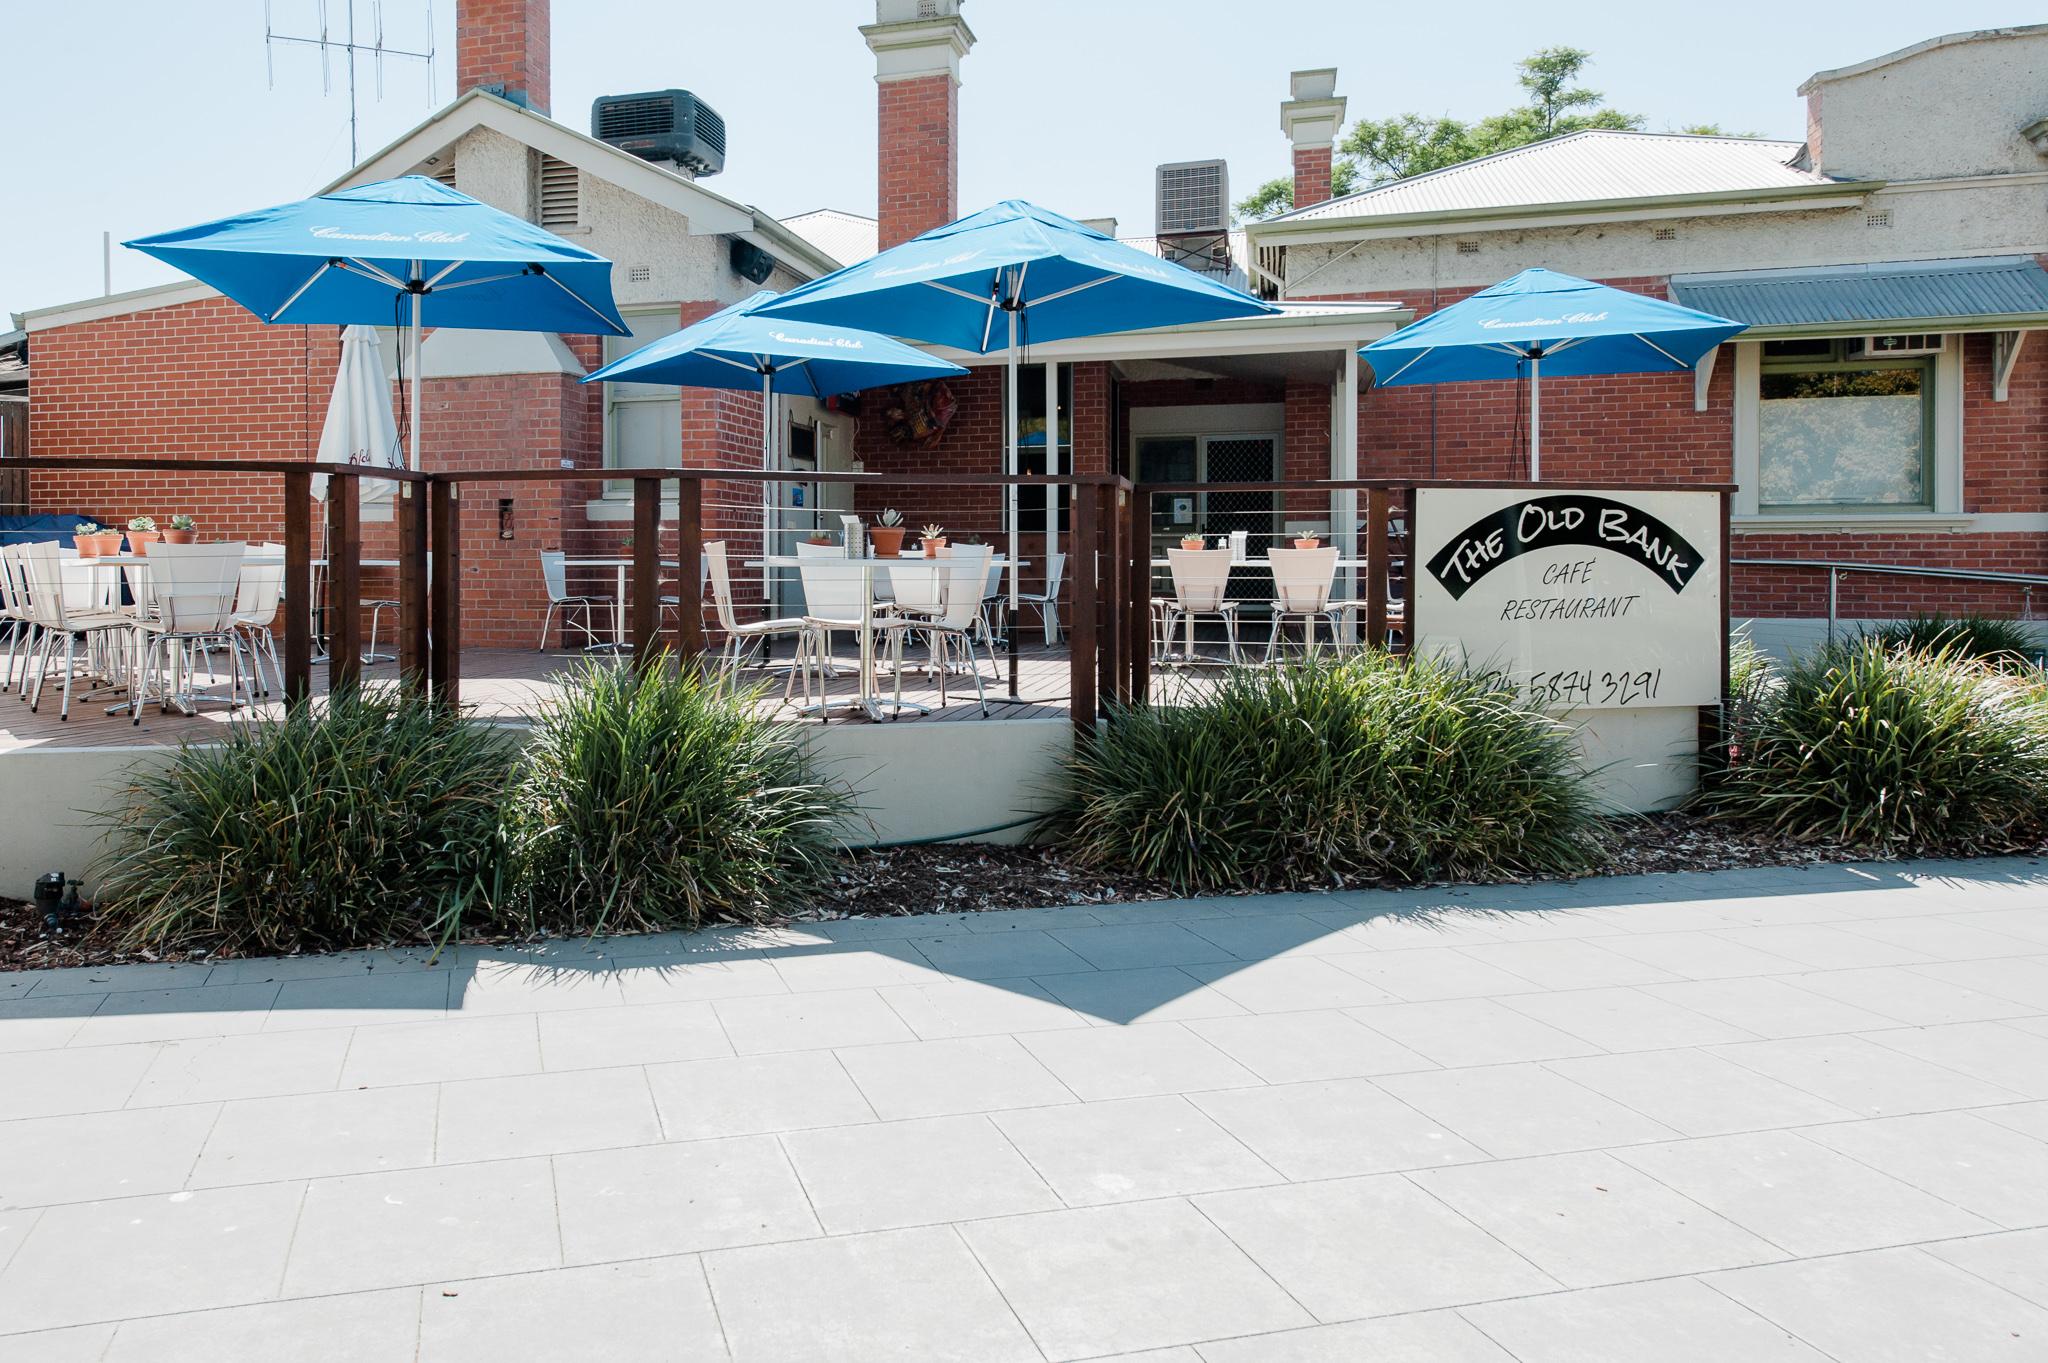 2 Outside dining TOB - Georgie James-1.jpg